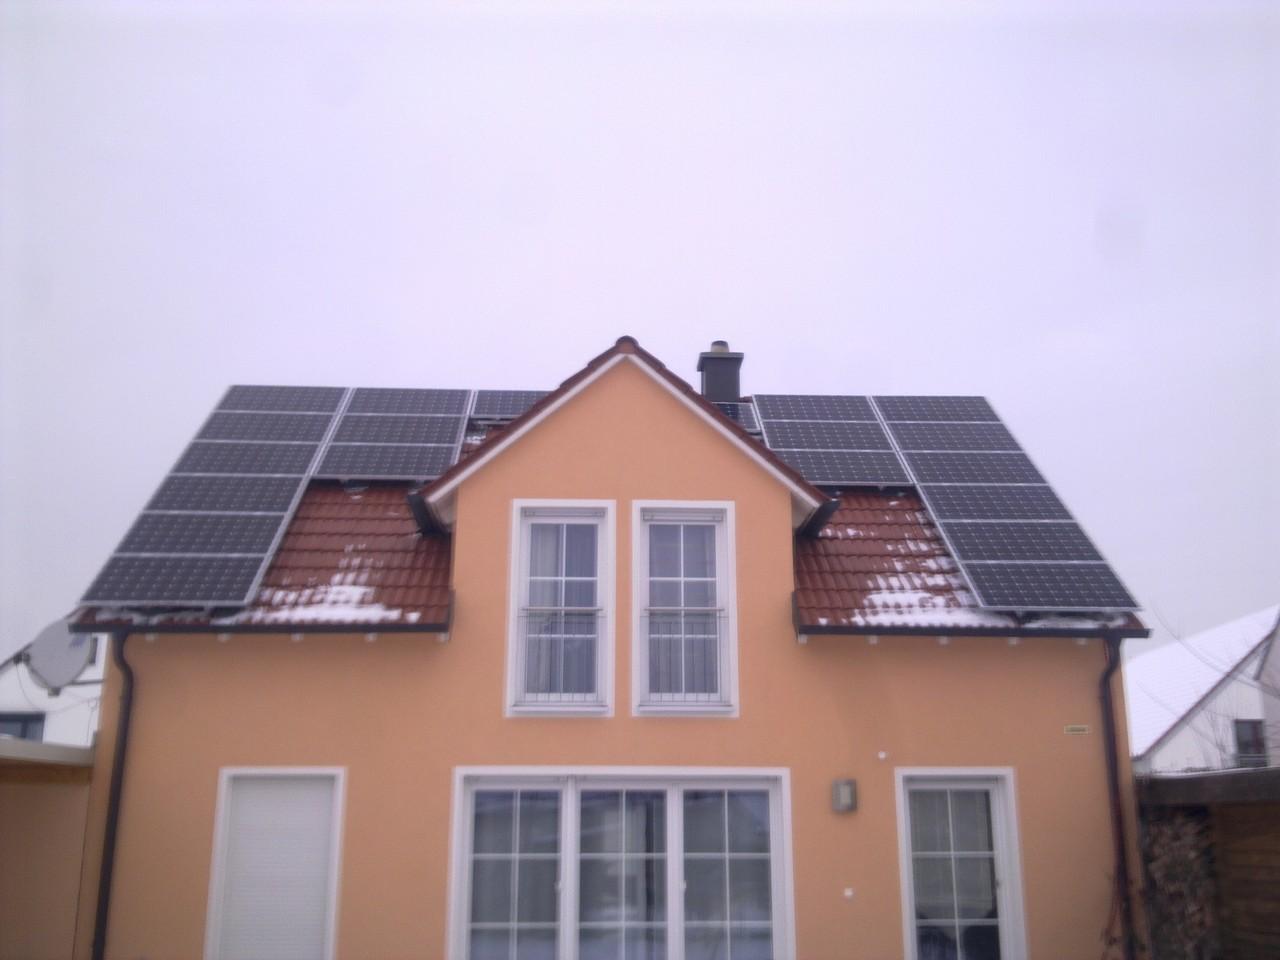 5,5 kWp Photovoltaikanlage in 93055 Burgweinting